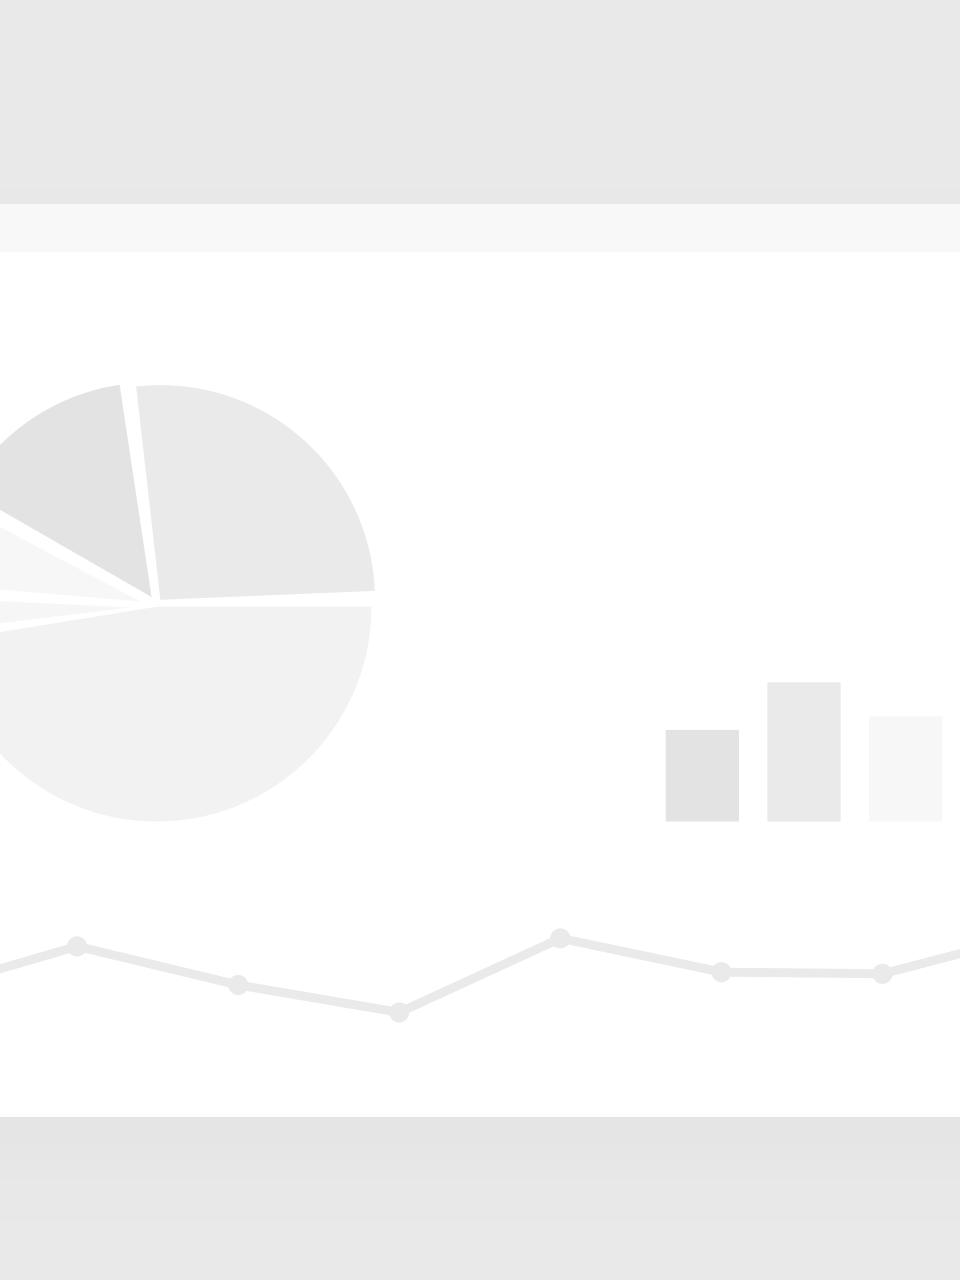 seo ranking report